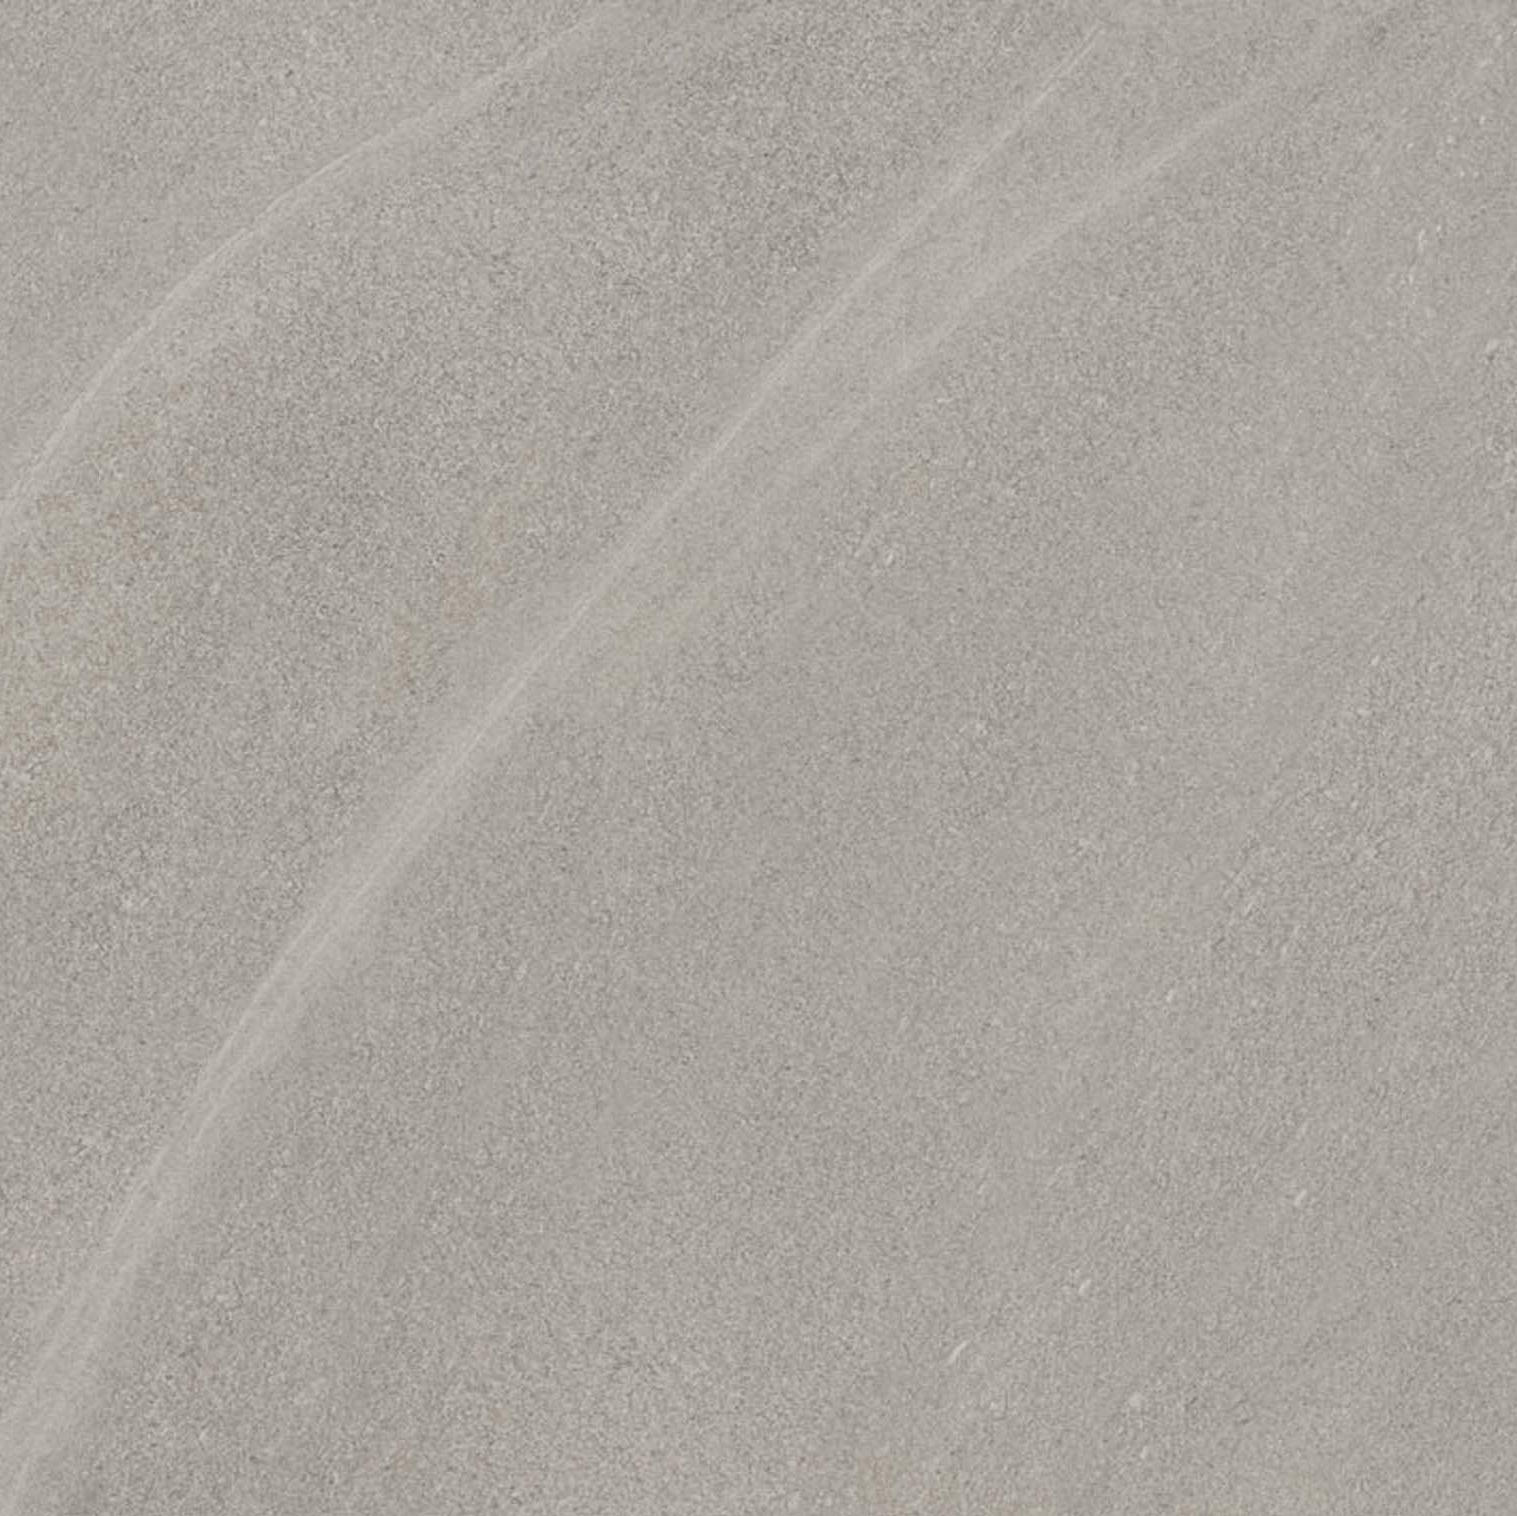 stoneproject-98665r-greige-controfalda-60-120-1-1-b.jpg